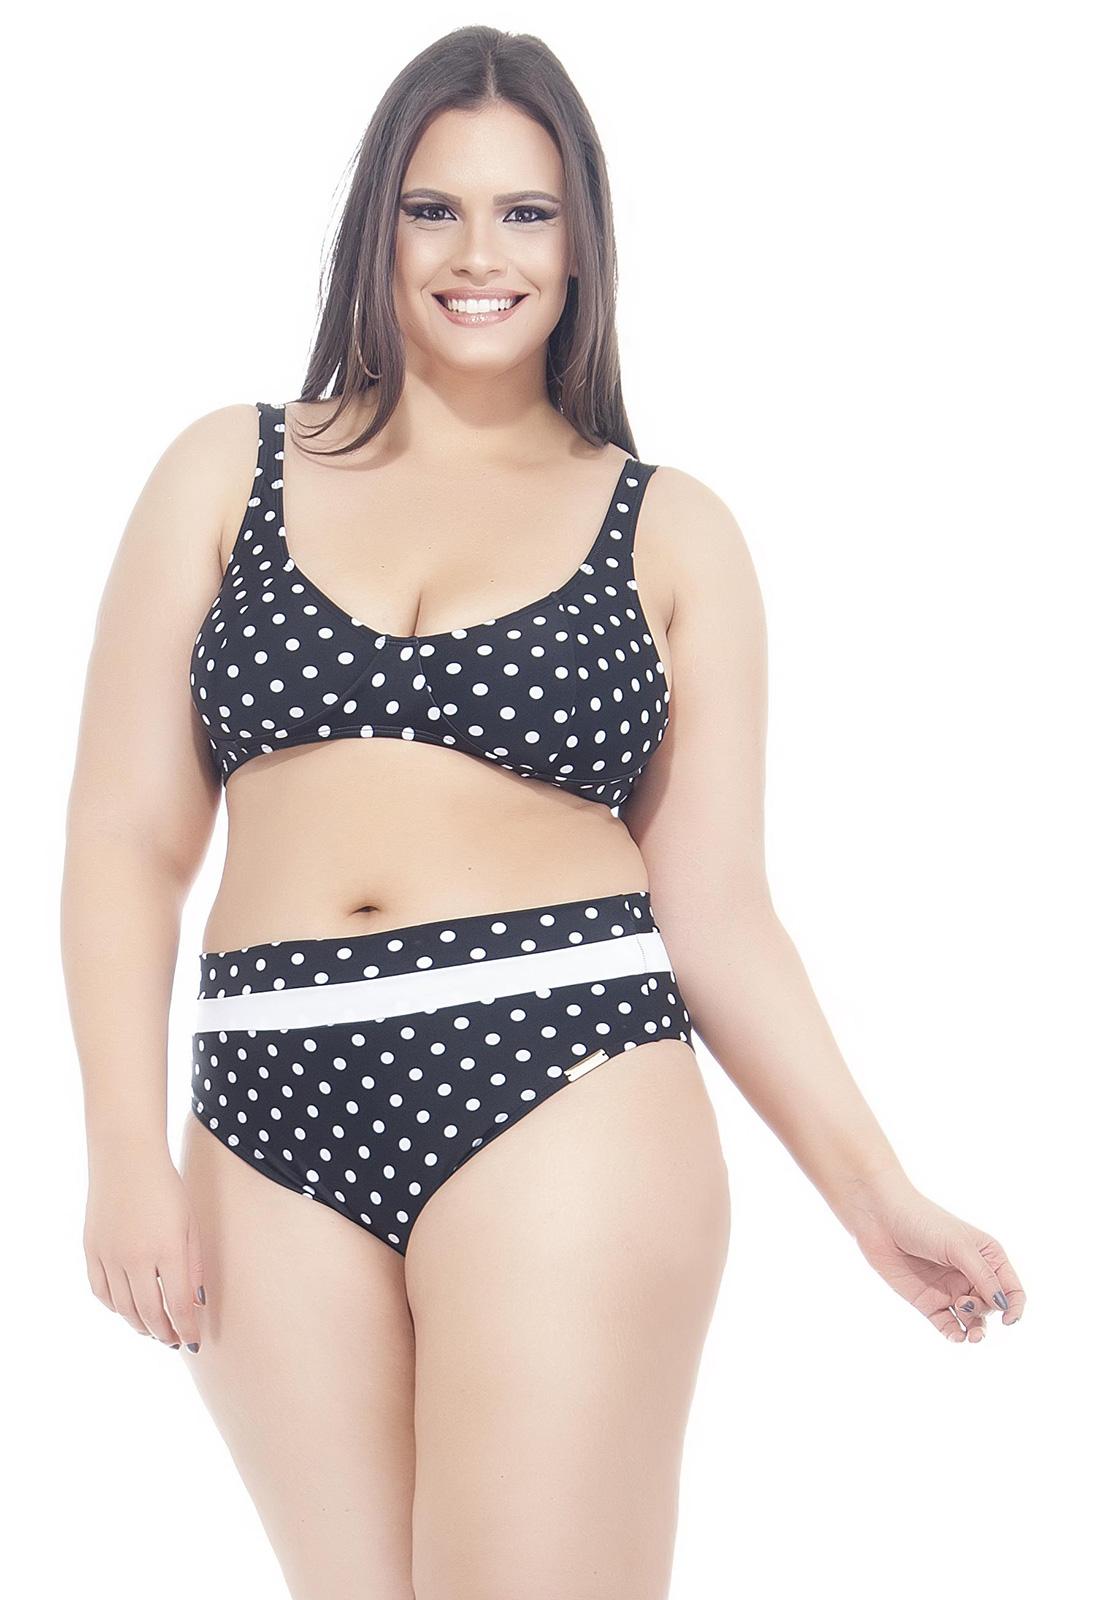 Retro Polka Dot Bra Bikini In Large Sizes Petit Poa